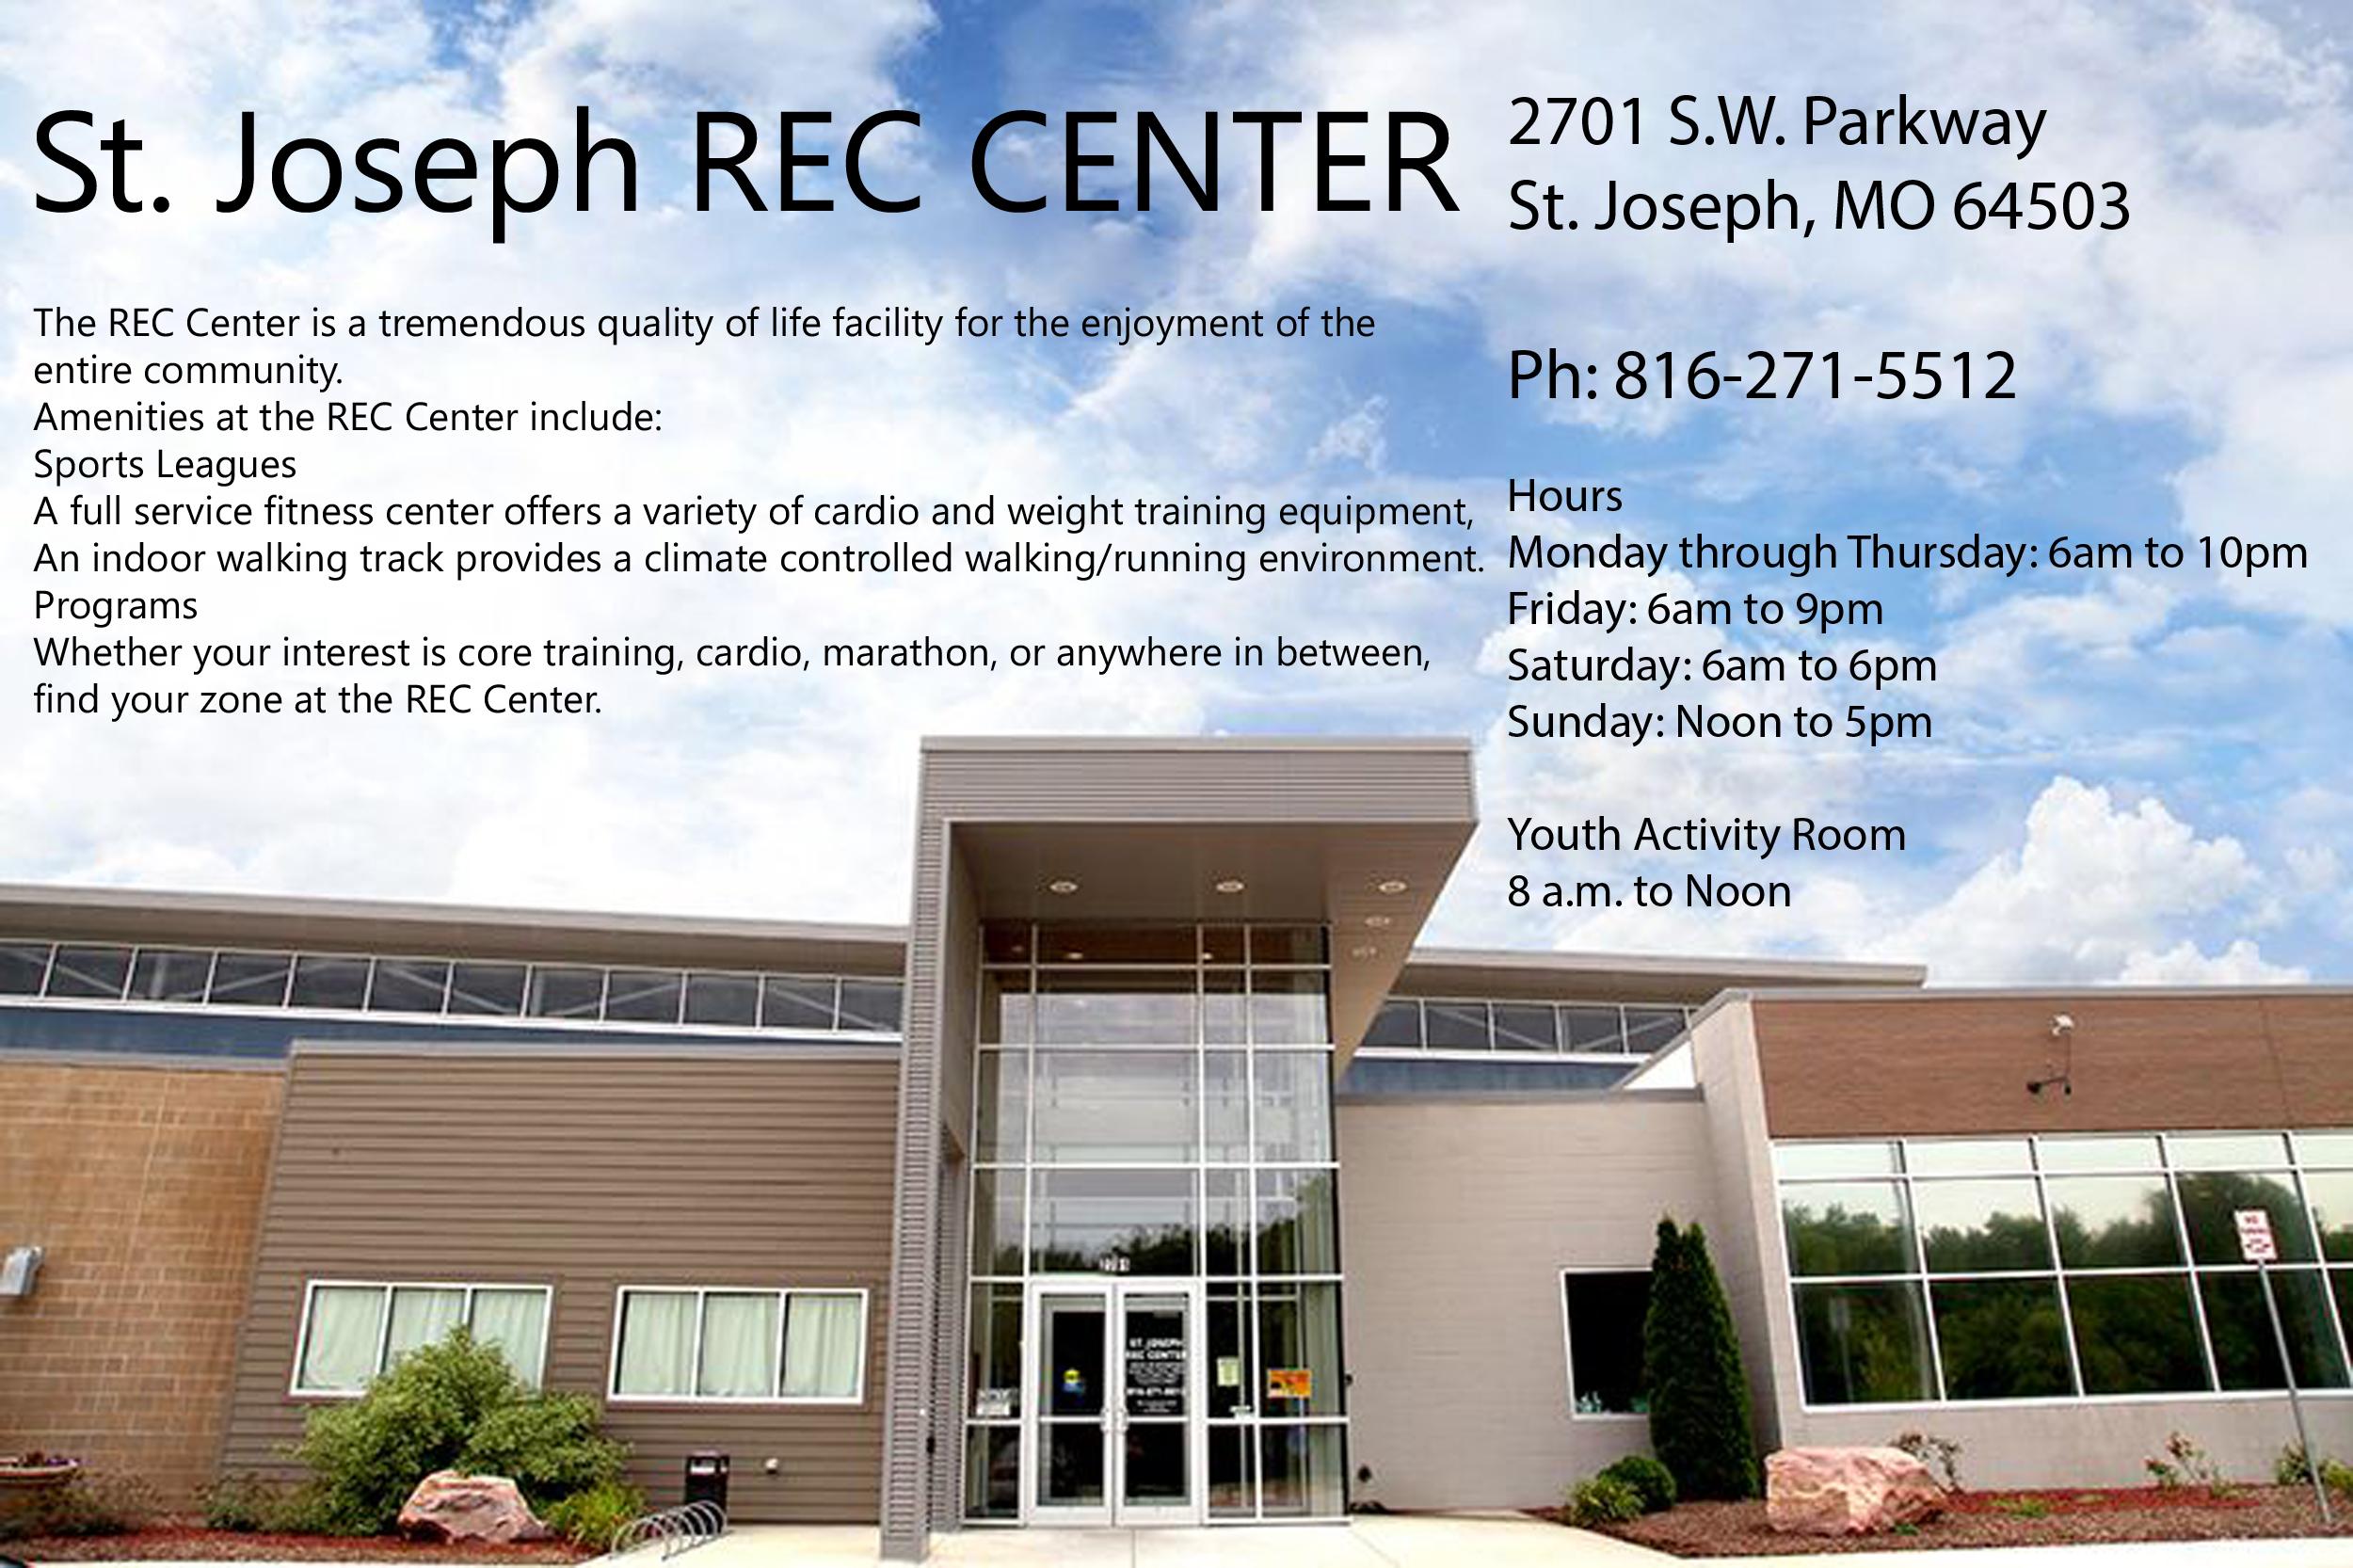 St Joseph REC Center photo and info